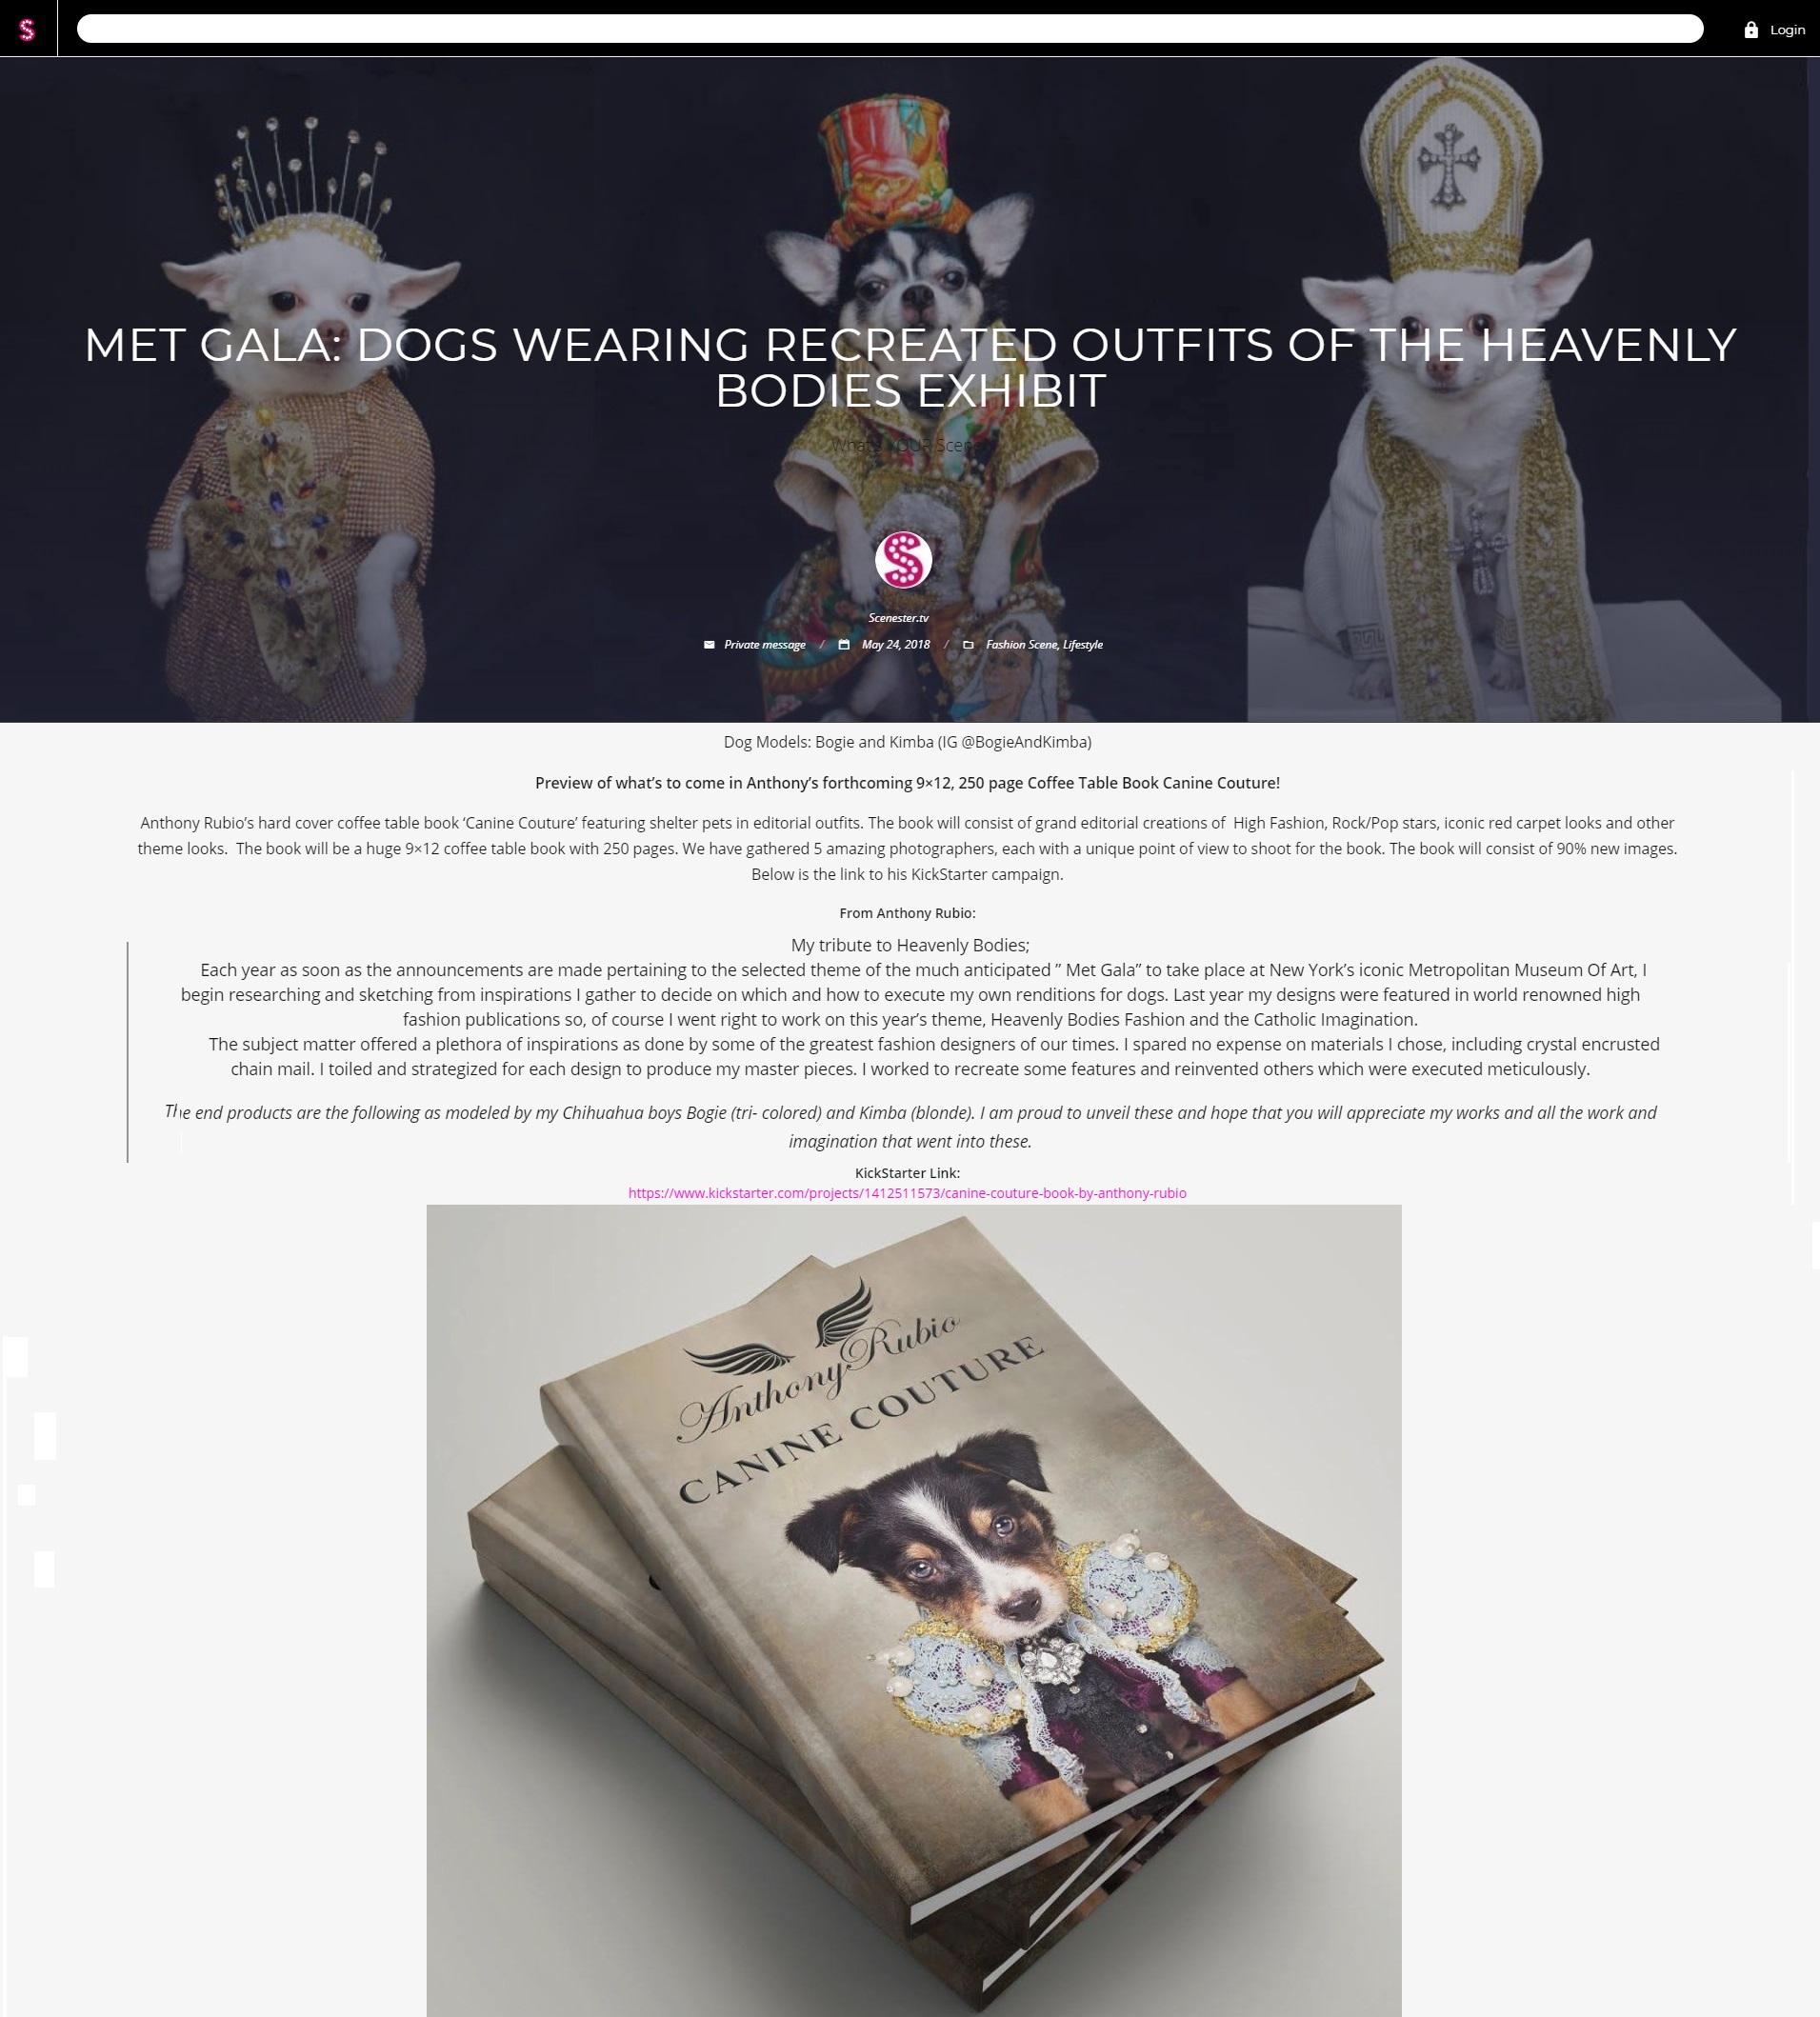 Anthony Rubio, Met Gala 2018, Heavenly Bodies, Dog Fashion,  558801 new 100.jpg